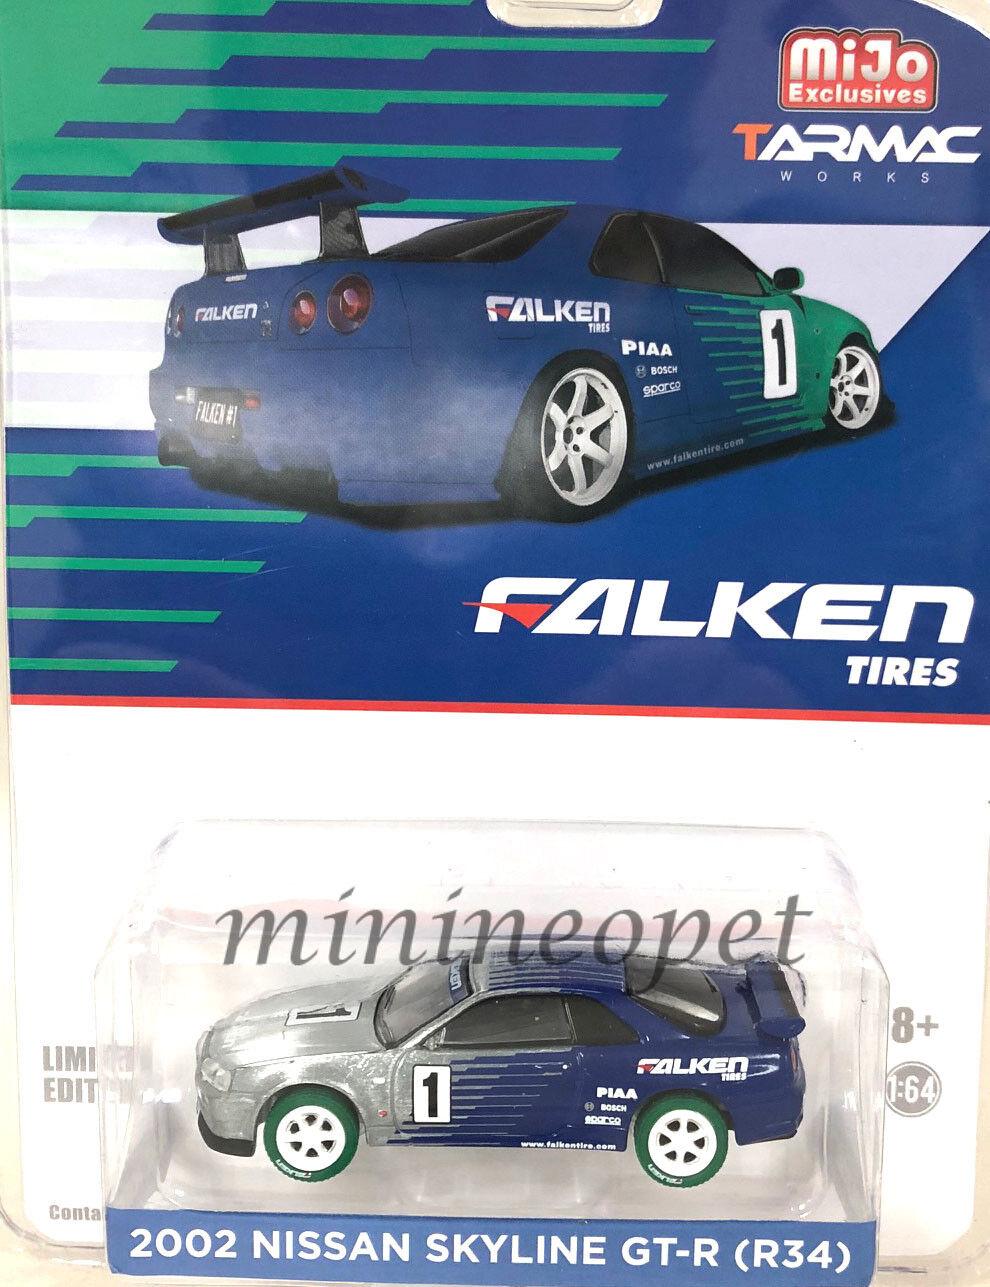 51150 Tarmac Works 2002 Nissan Skyline GT-R R34 FALKEN Neumáticos 1 64 Chase